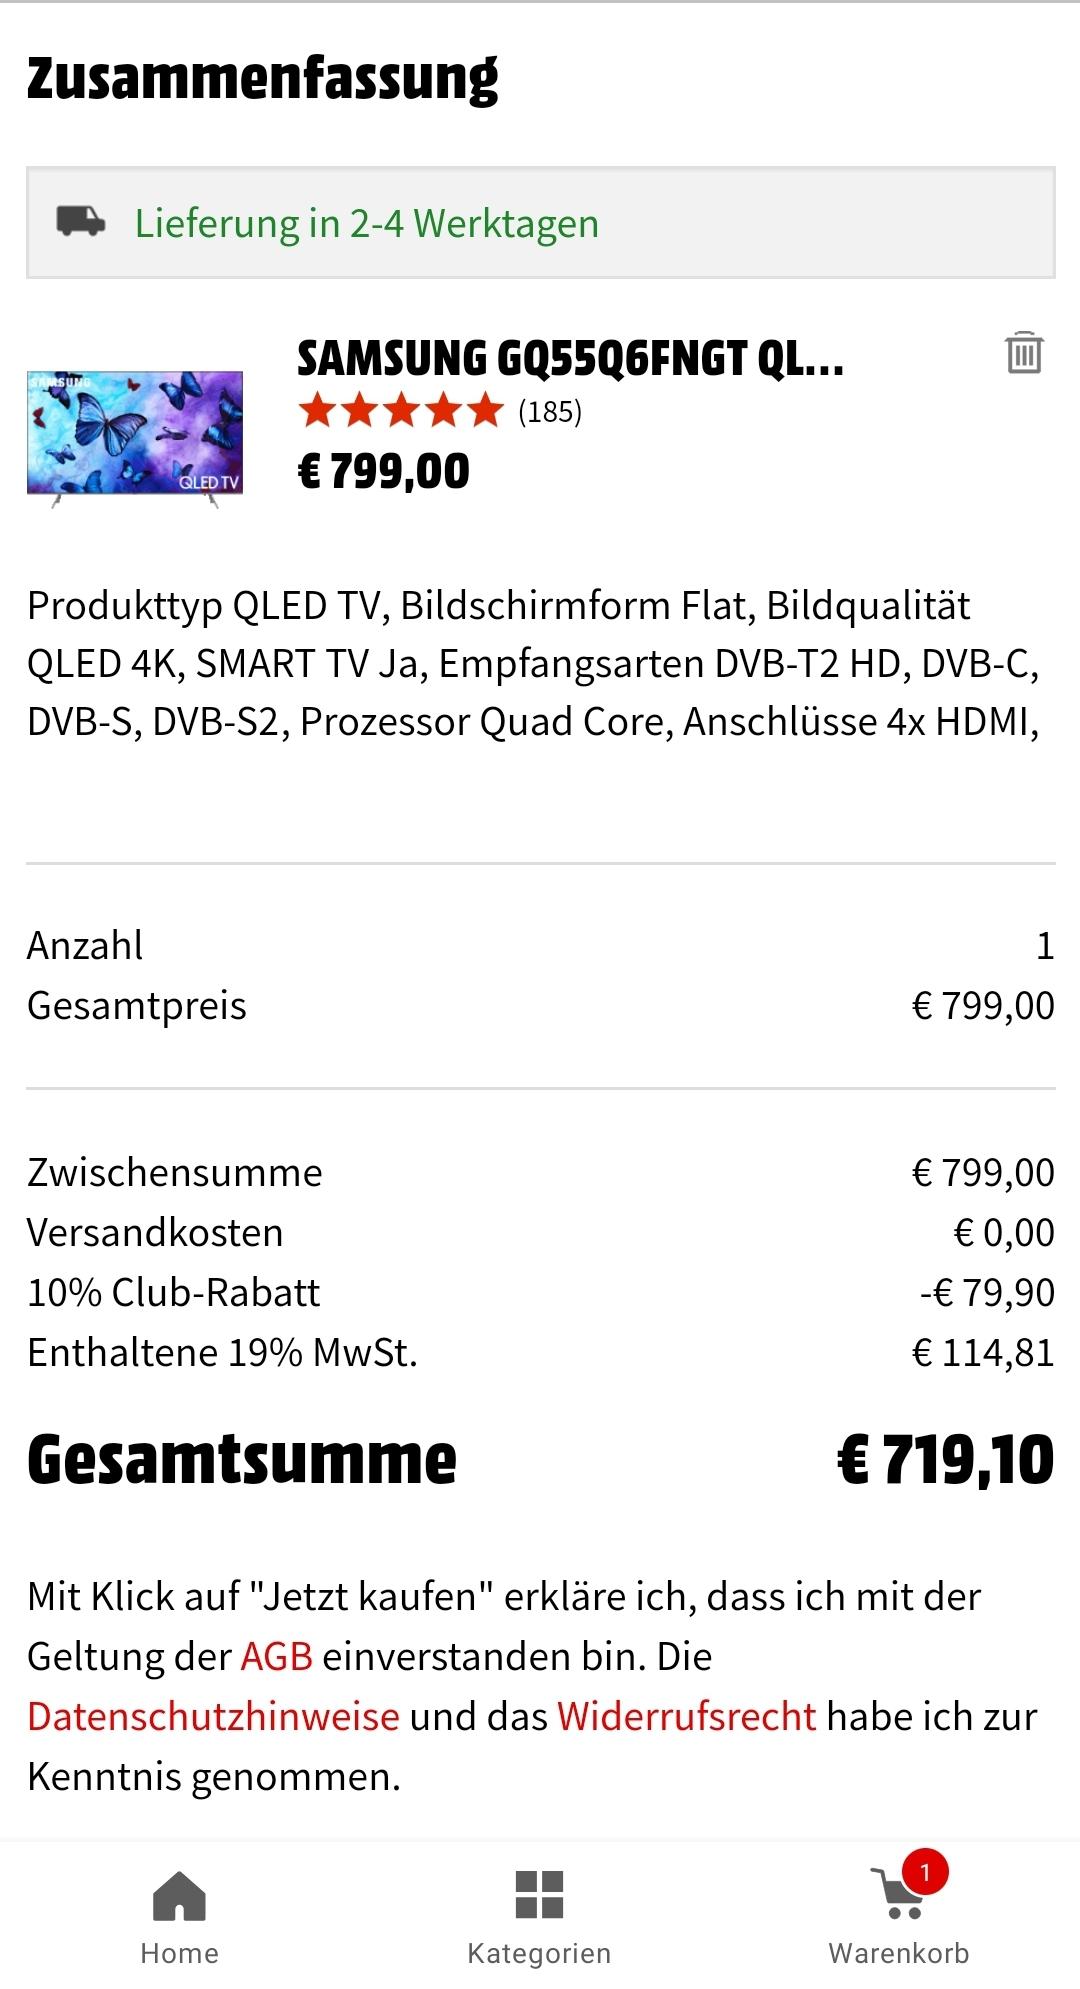 Samsung QLED UHD 4K GQ55Q6FNGT 100 HZ 138 CM (55 ZOLL), QLED 4K, SMART TV, QLED TV, 2800 PQI, DVB-T2 HD, DVB-C, DVB-S, DVB-S2